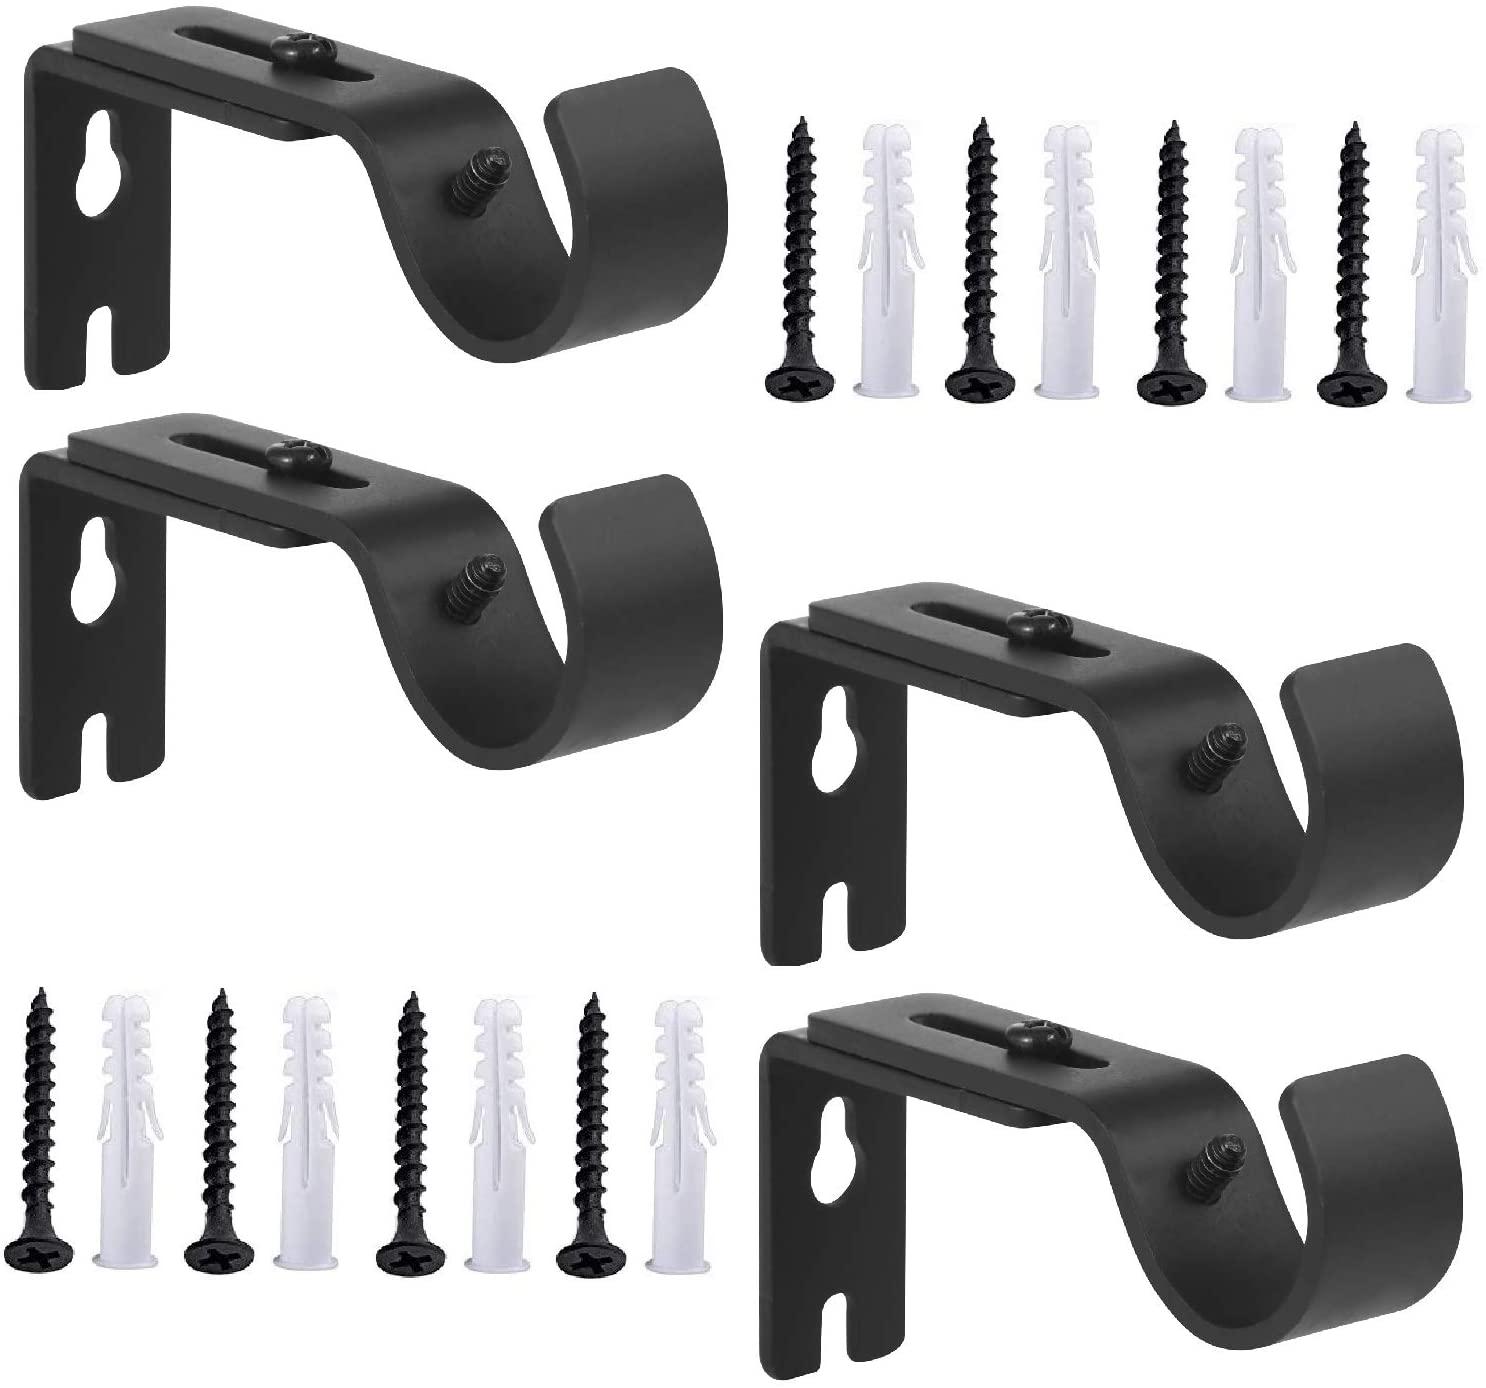 Anndason Heavy Duty Adjustable Curtain Rod Brackets Rod Holders for 1 Inch Rod, Black Color, (Set of 4,Black)